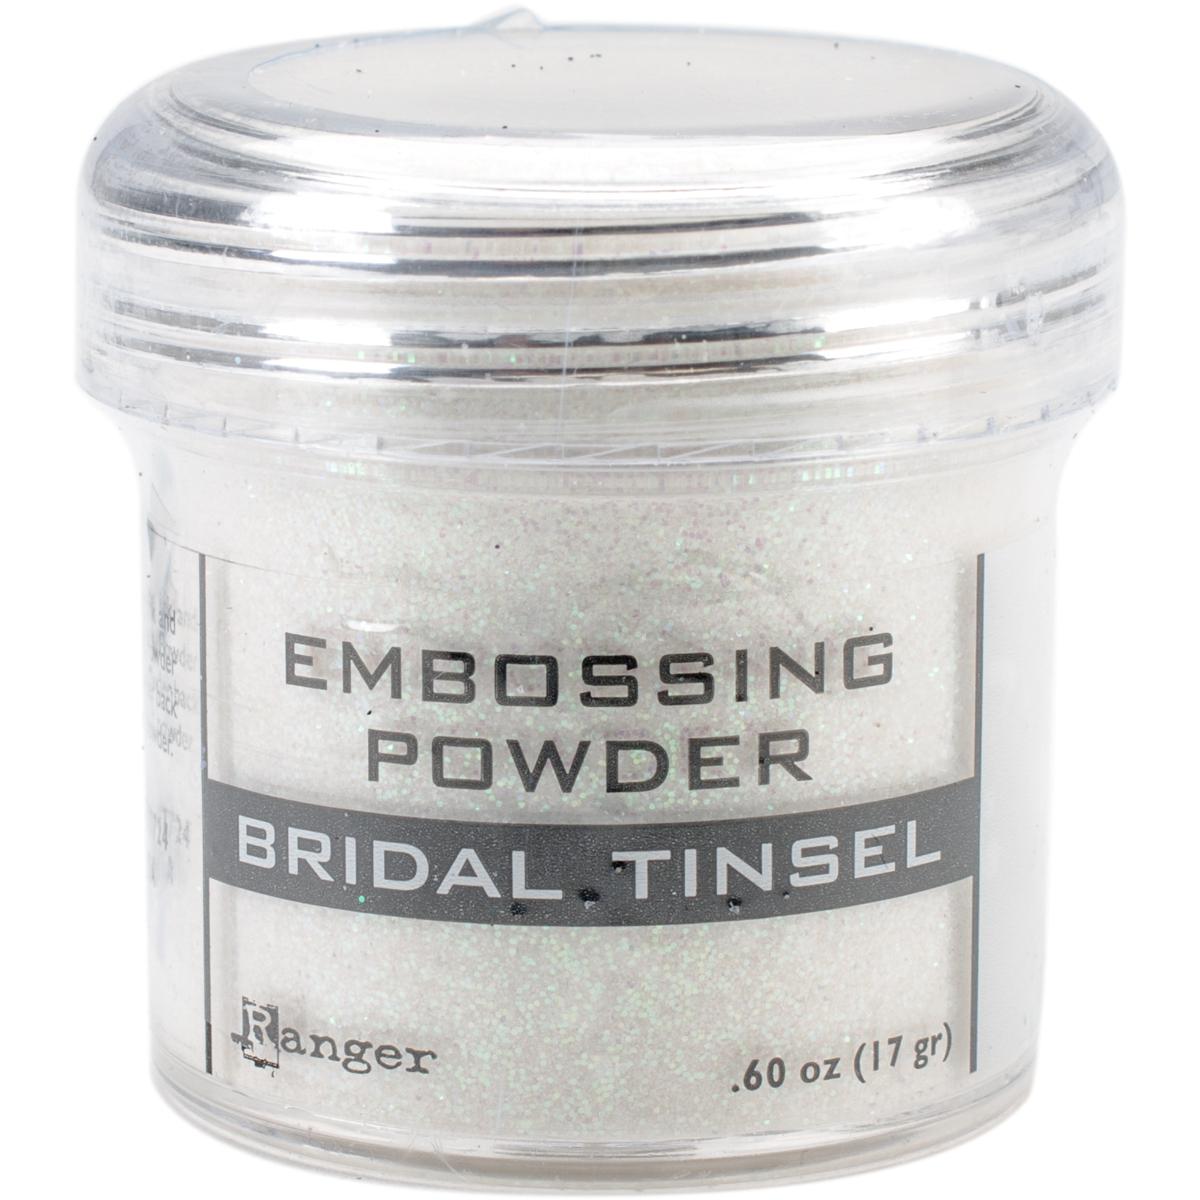 Embossing Powder-Bridal Tinsel